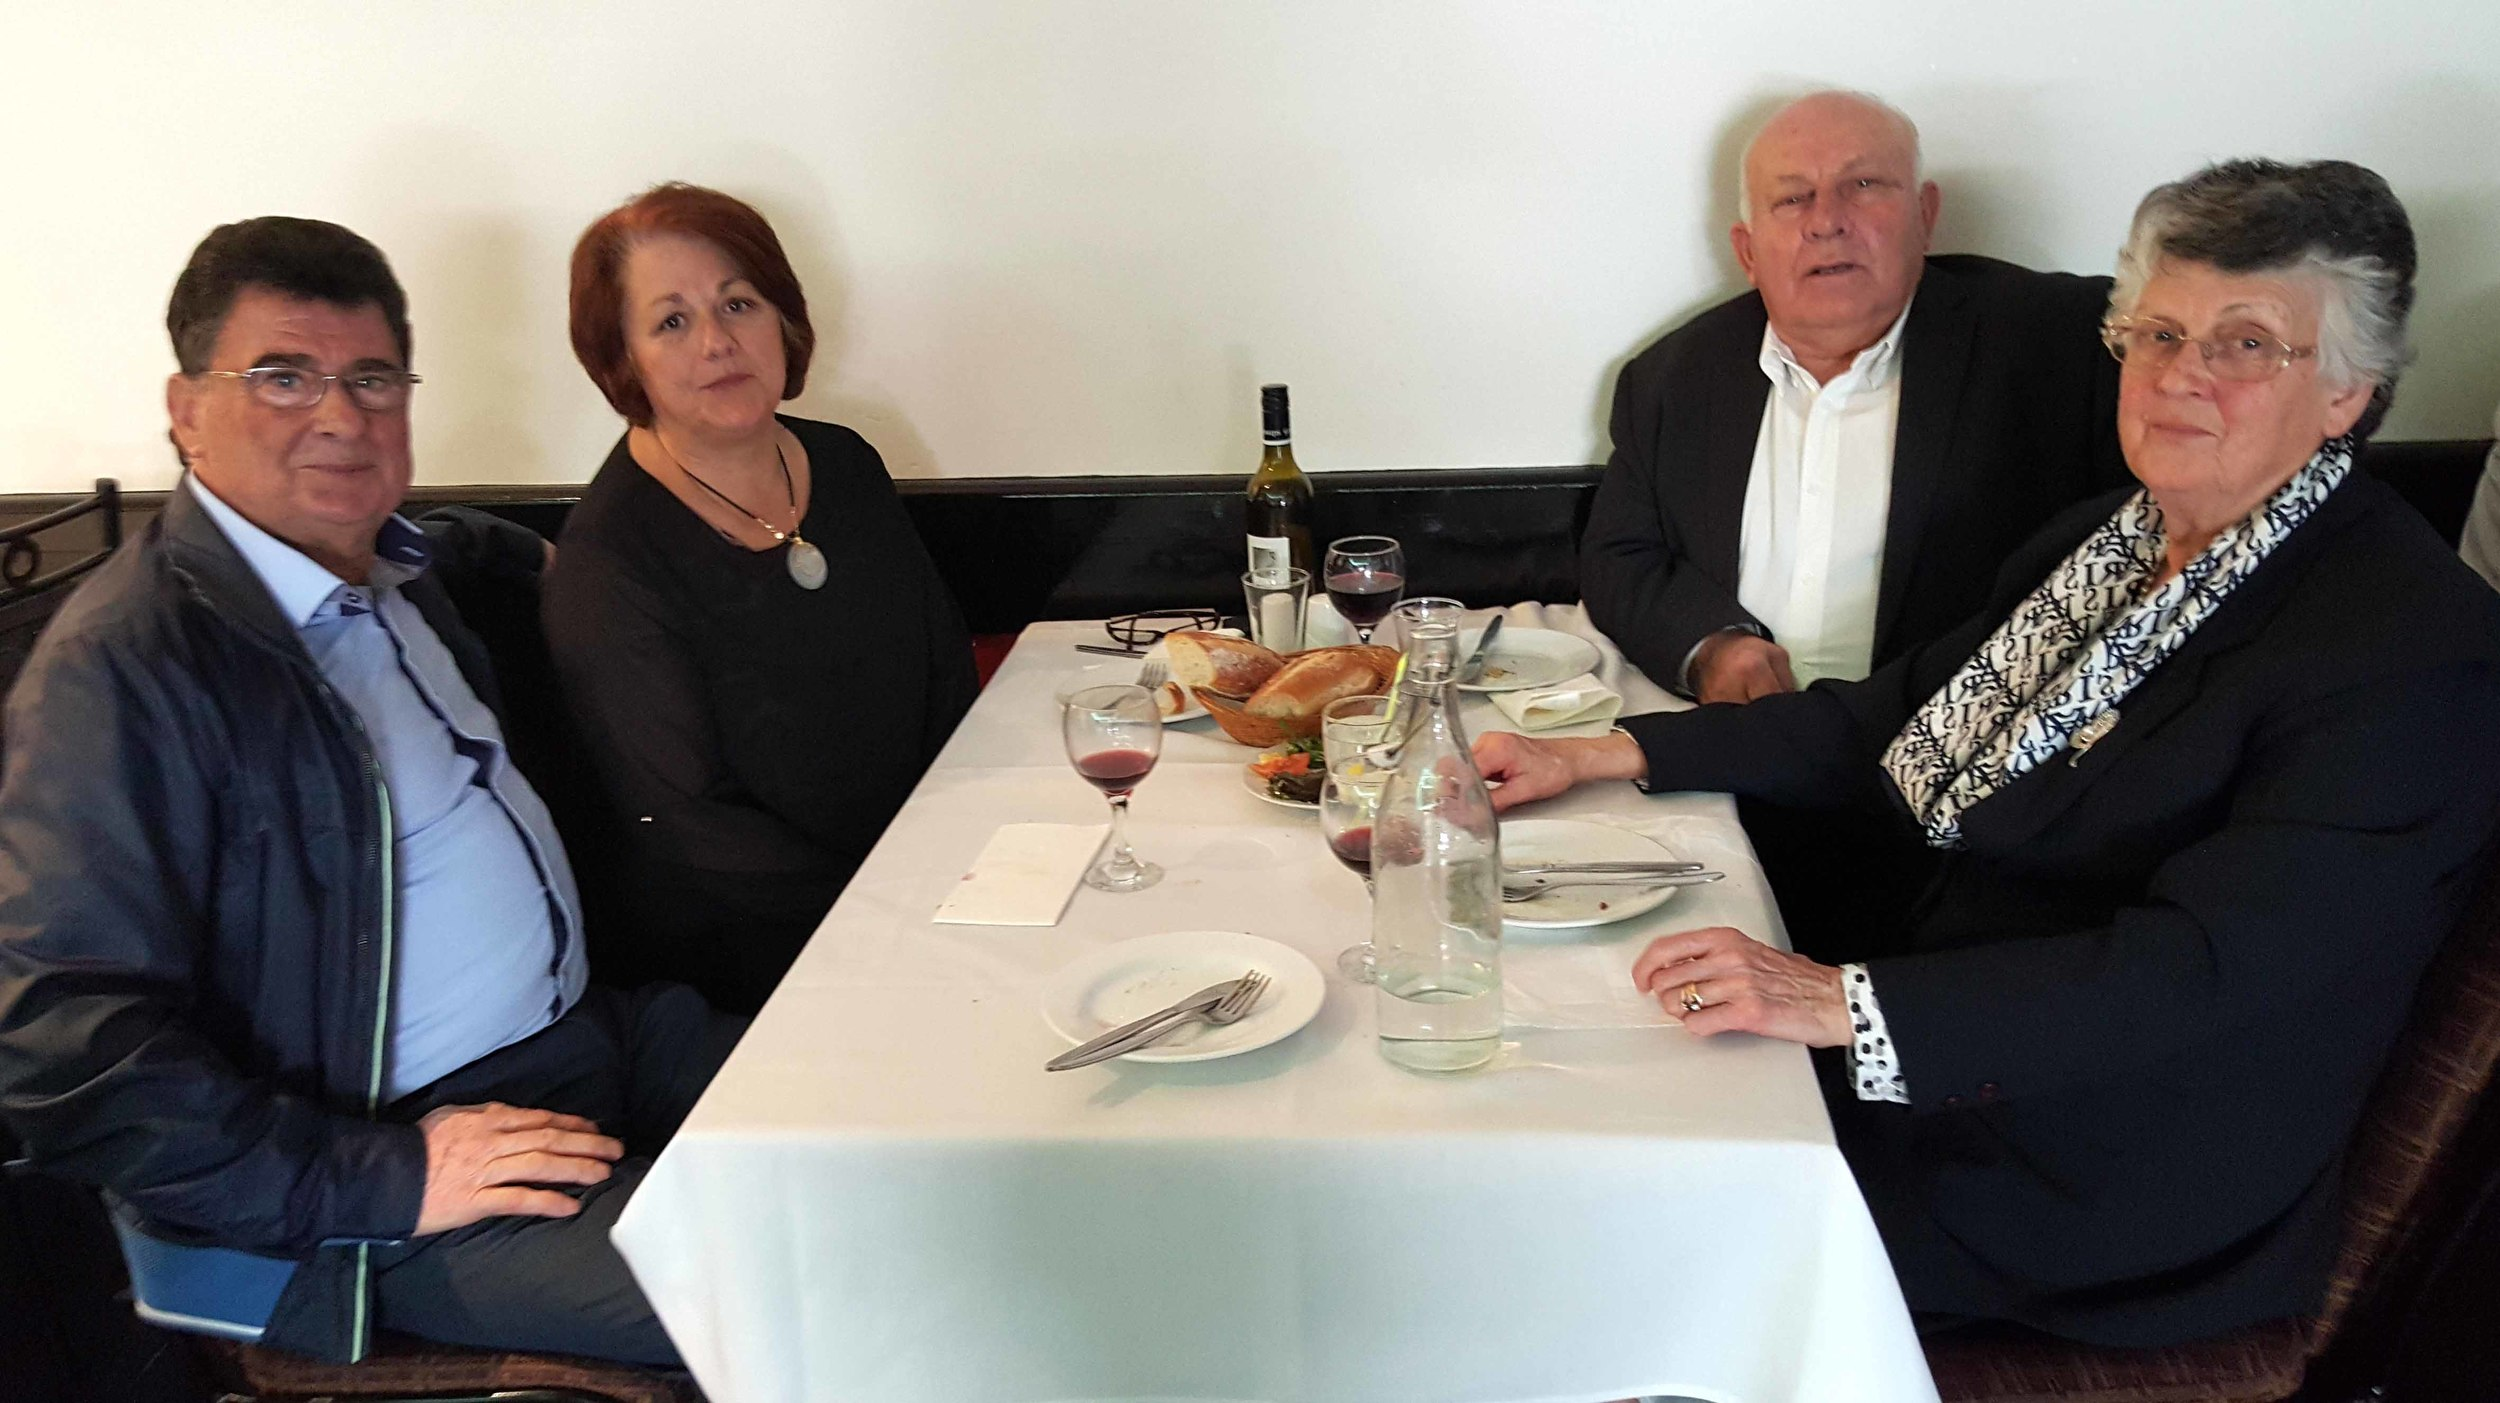 George and Tina Lymperis and John and Mela Limberis